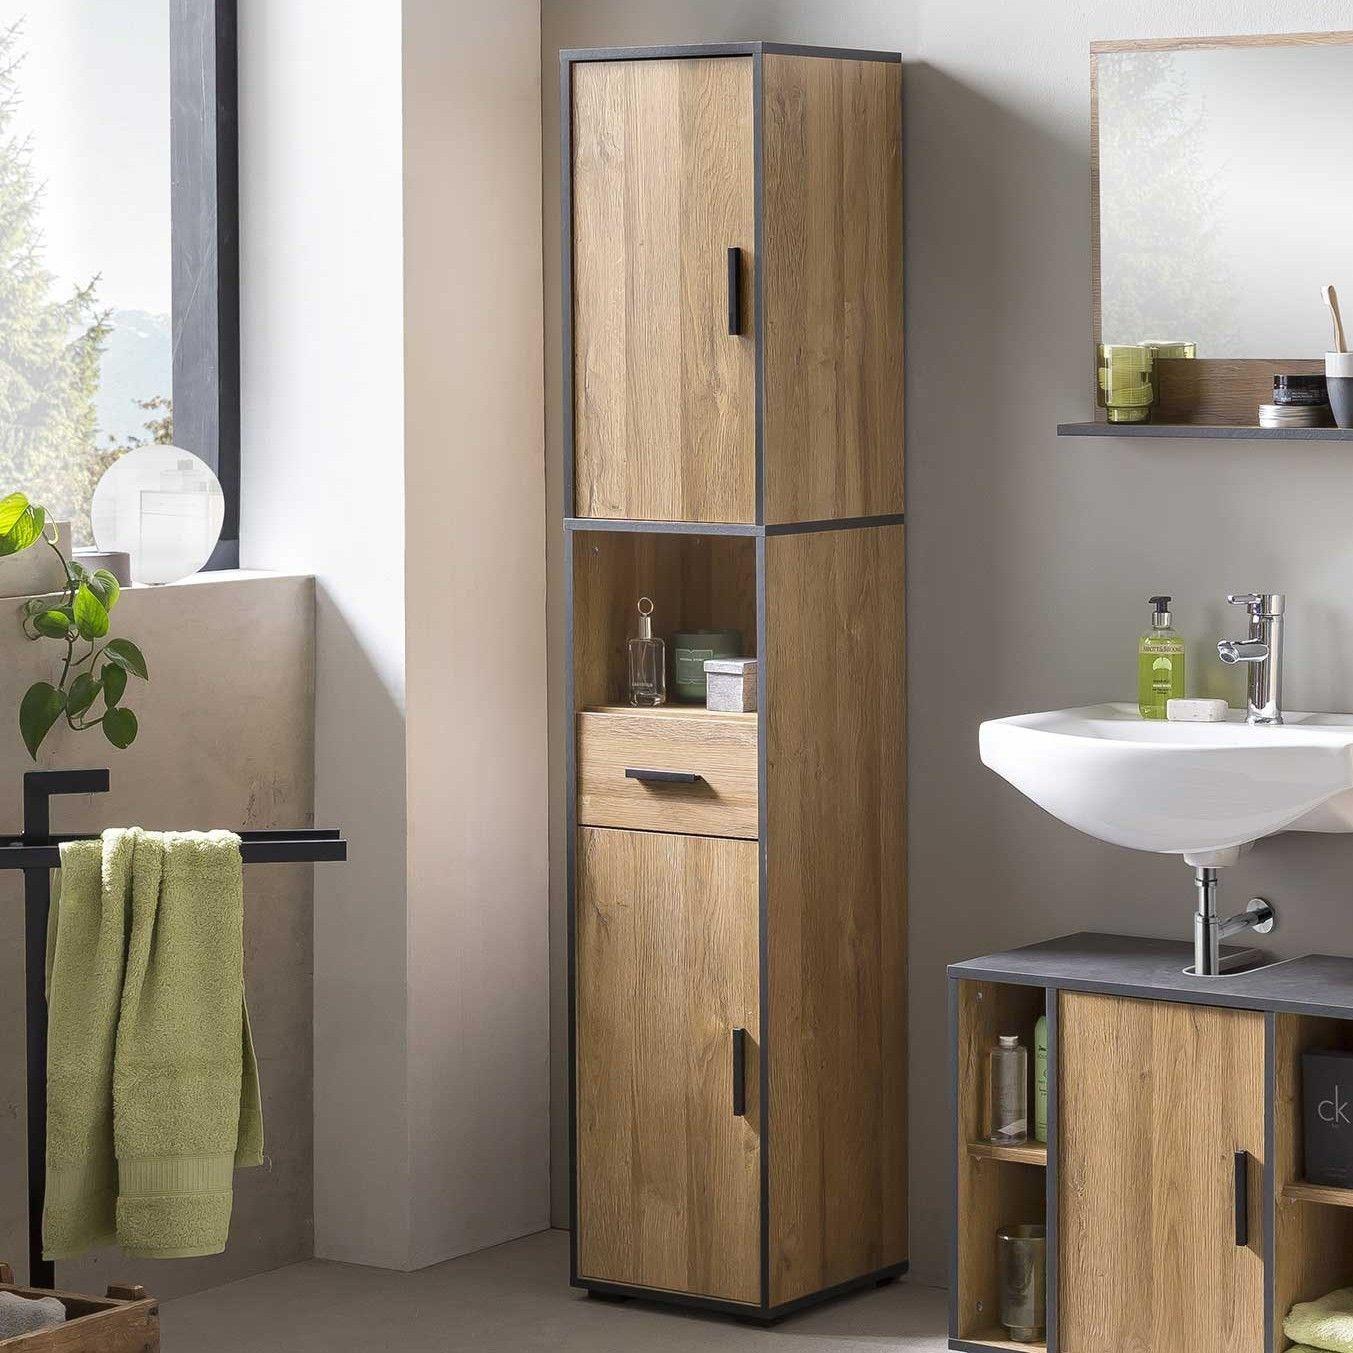 colonne salle de bains ariadna 2 portes 1 tiroir chene vieilli gris graphite